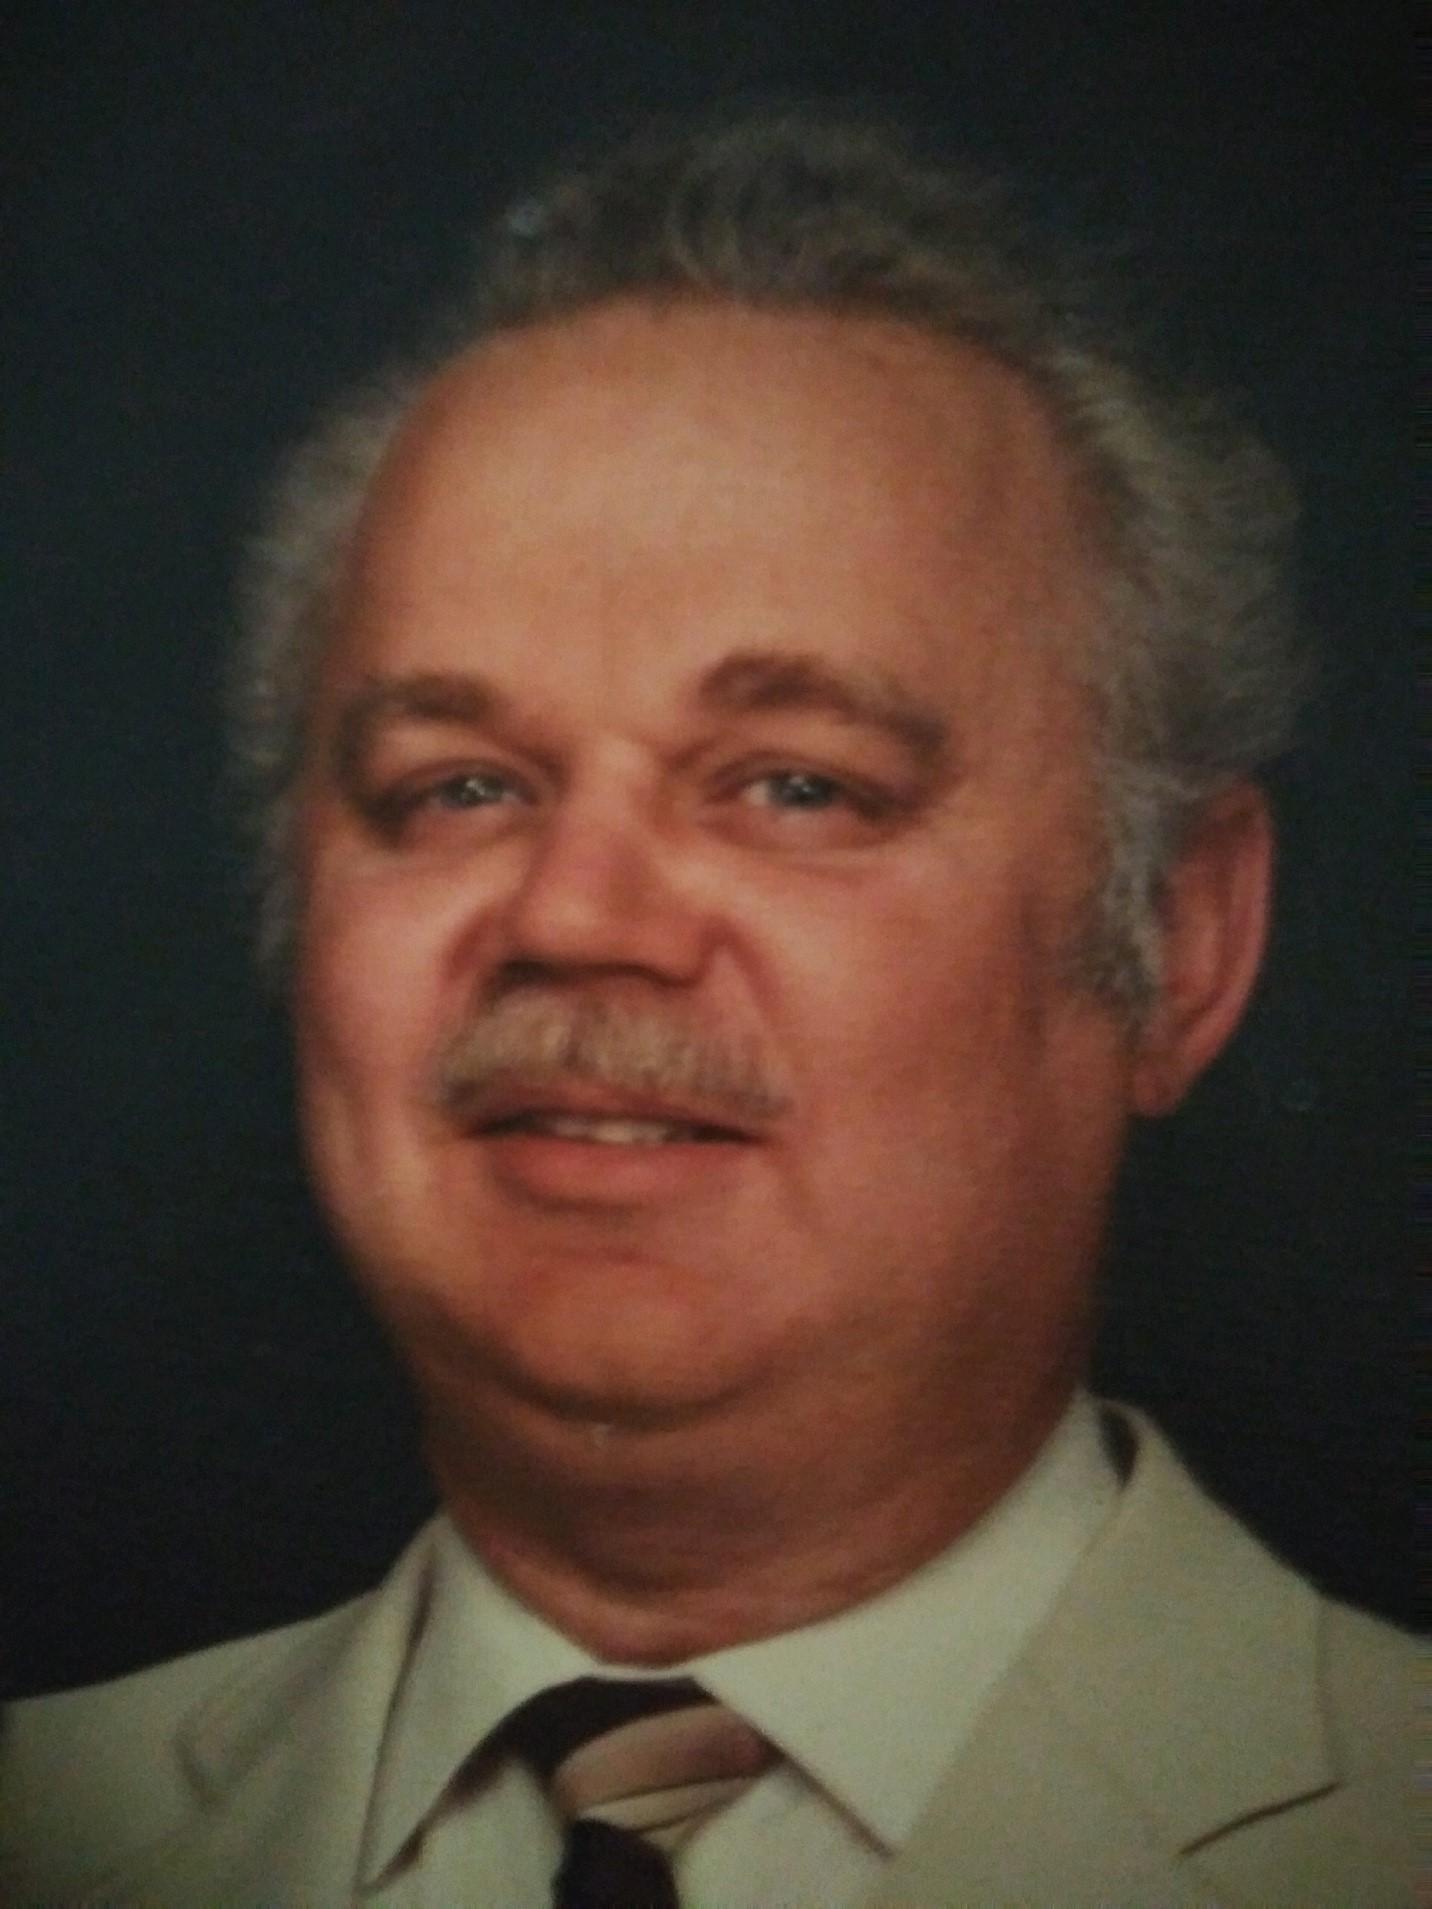 William Bleier